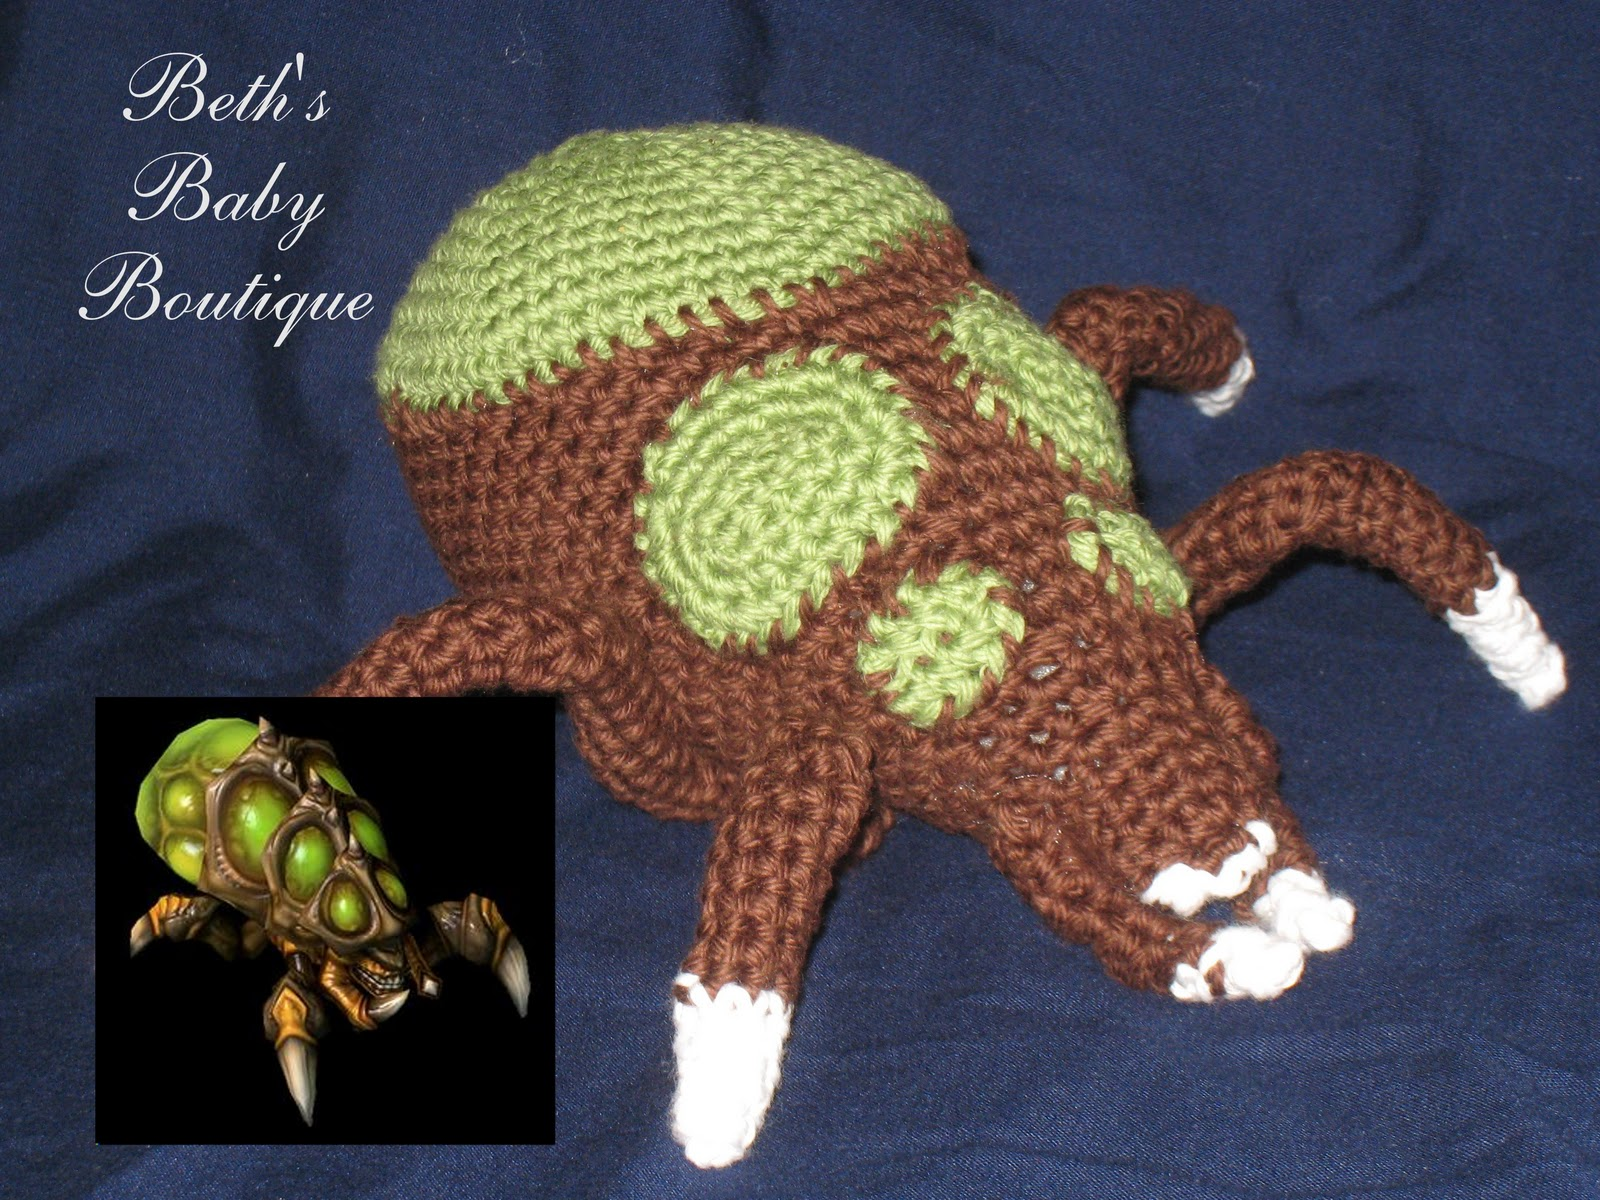 Amigurumi Starcraft : Beths Baby Boutique: January 2012